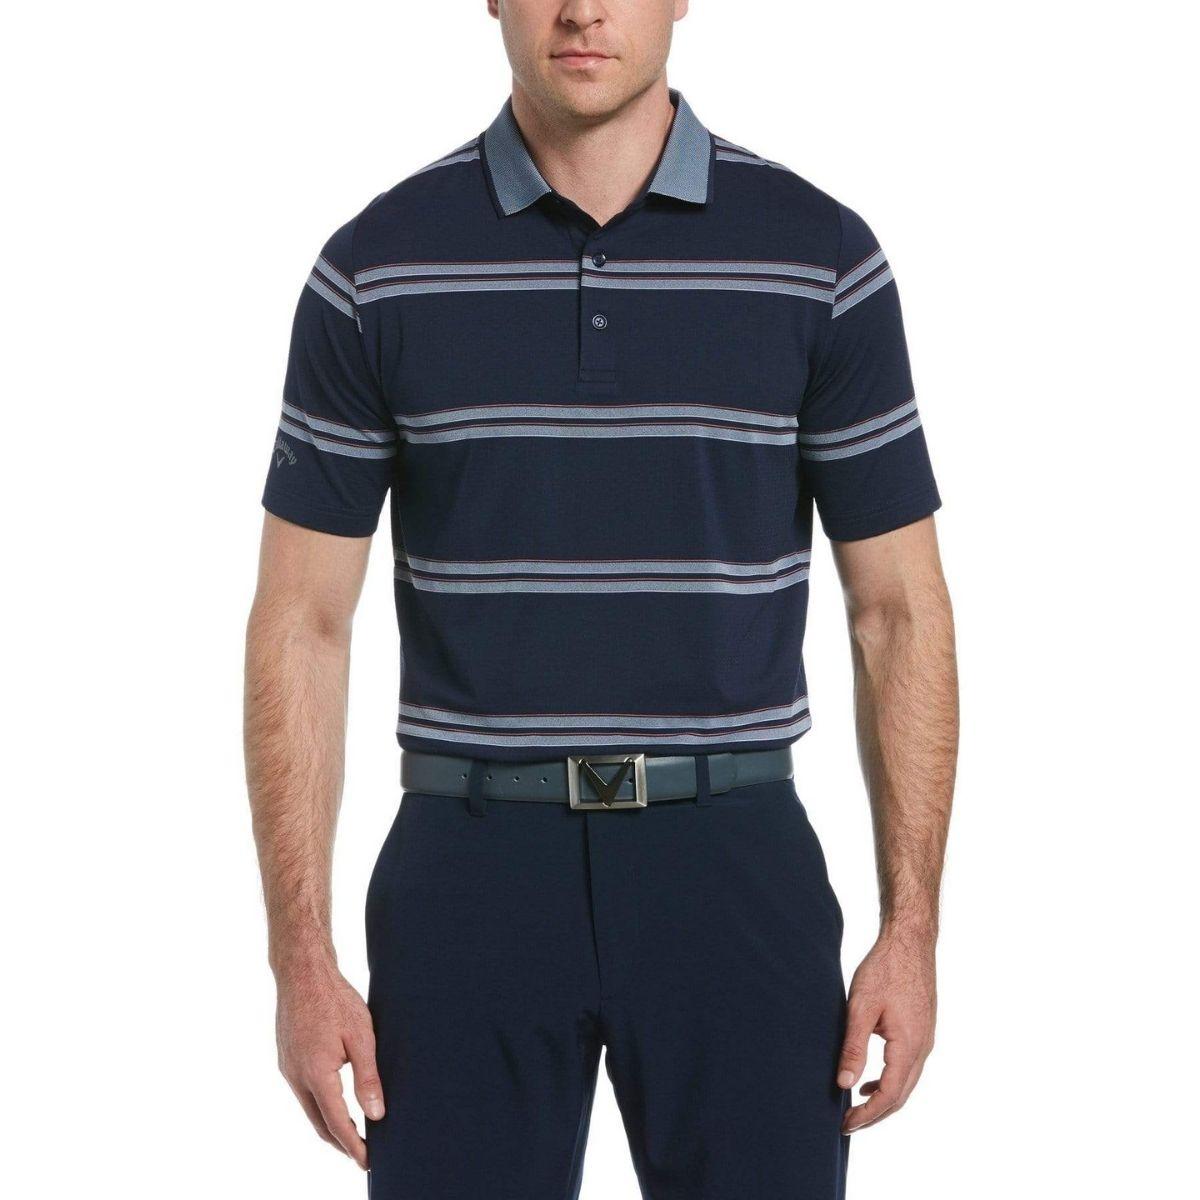 Callaway Men's Oxford Stripe Polo